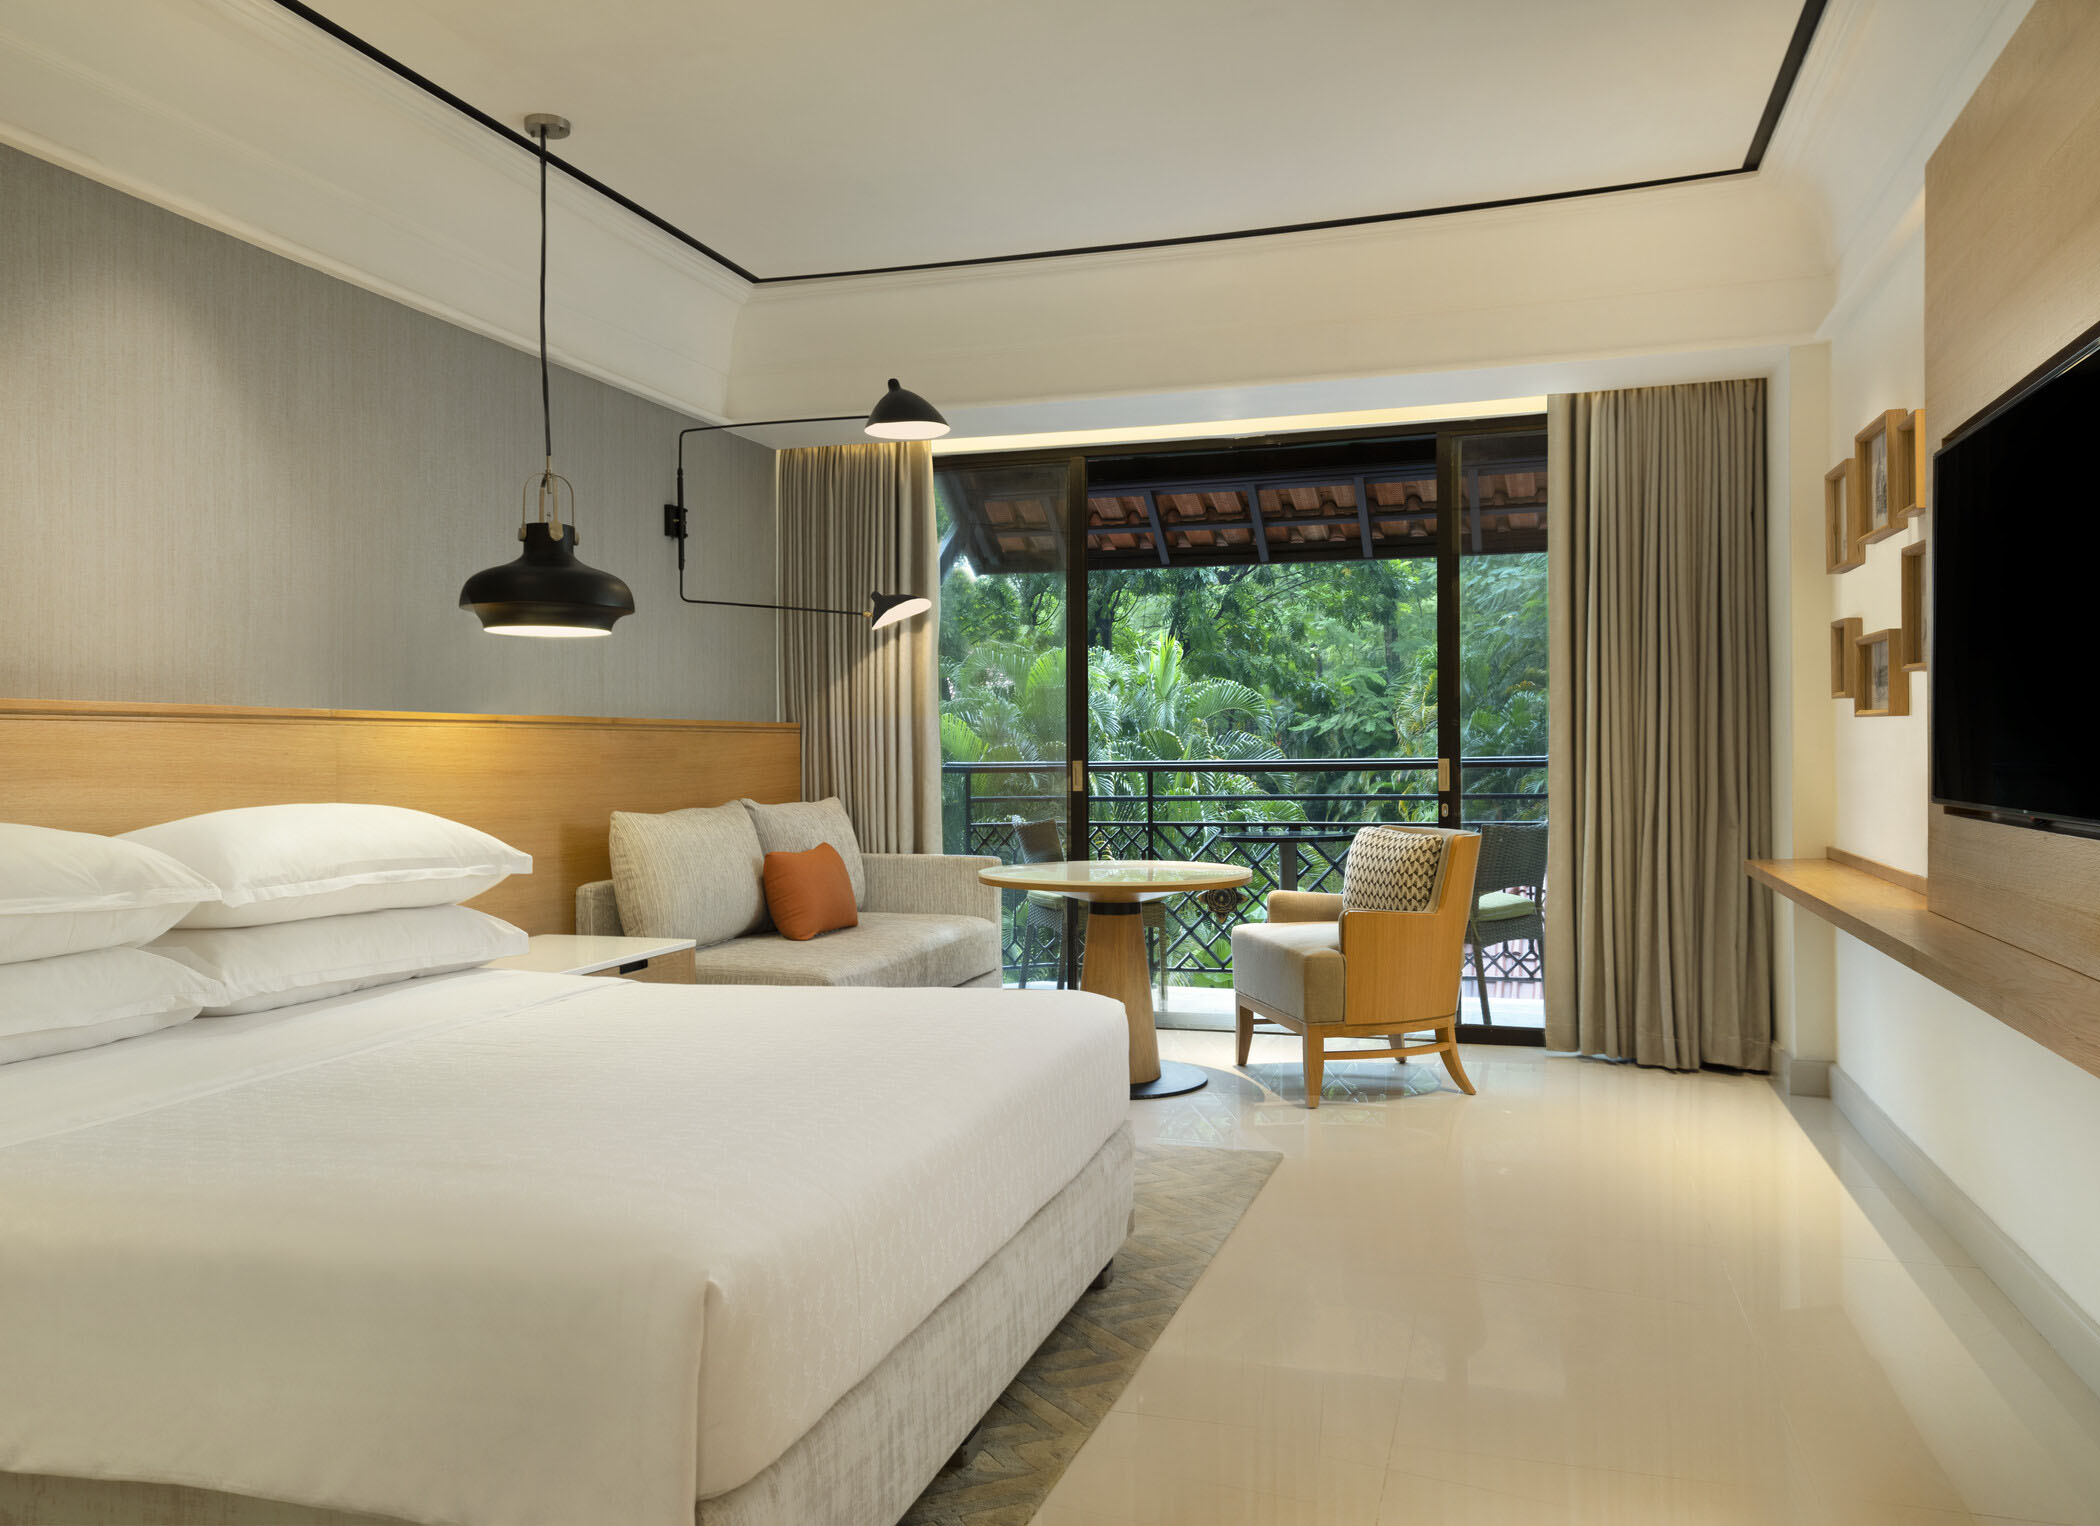 Sheraton Yogyakarta Luncurkan Voucher Buy Now, Travel Later Fun Experience, Paket Isolasi Mandiri dan Paket Upgrade